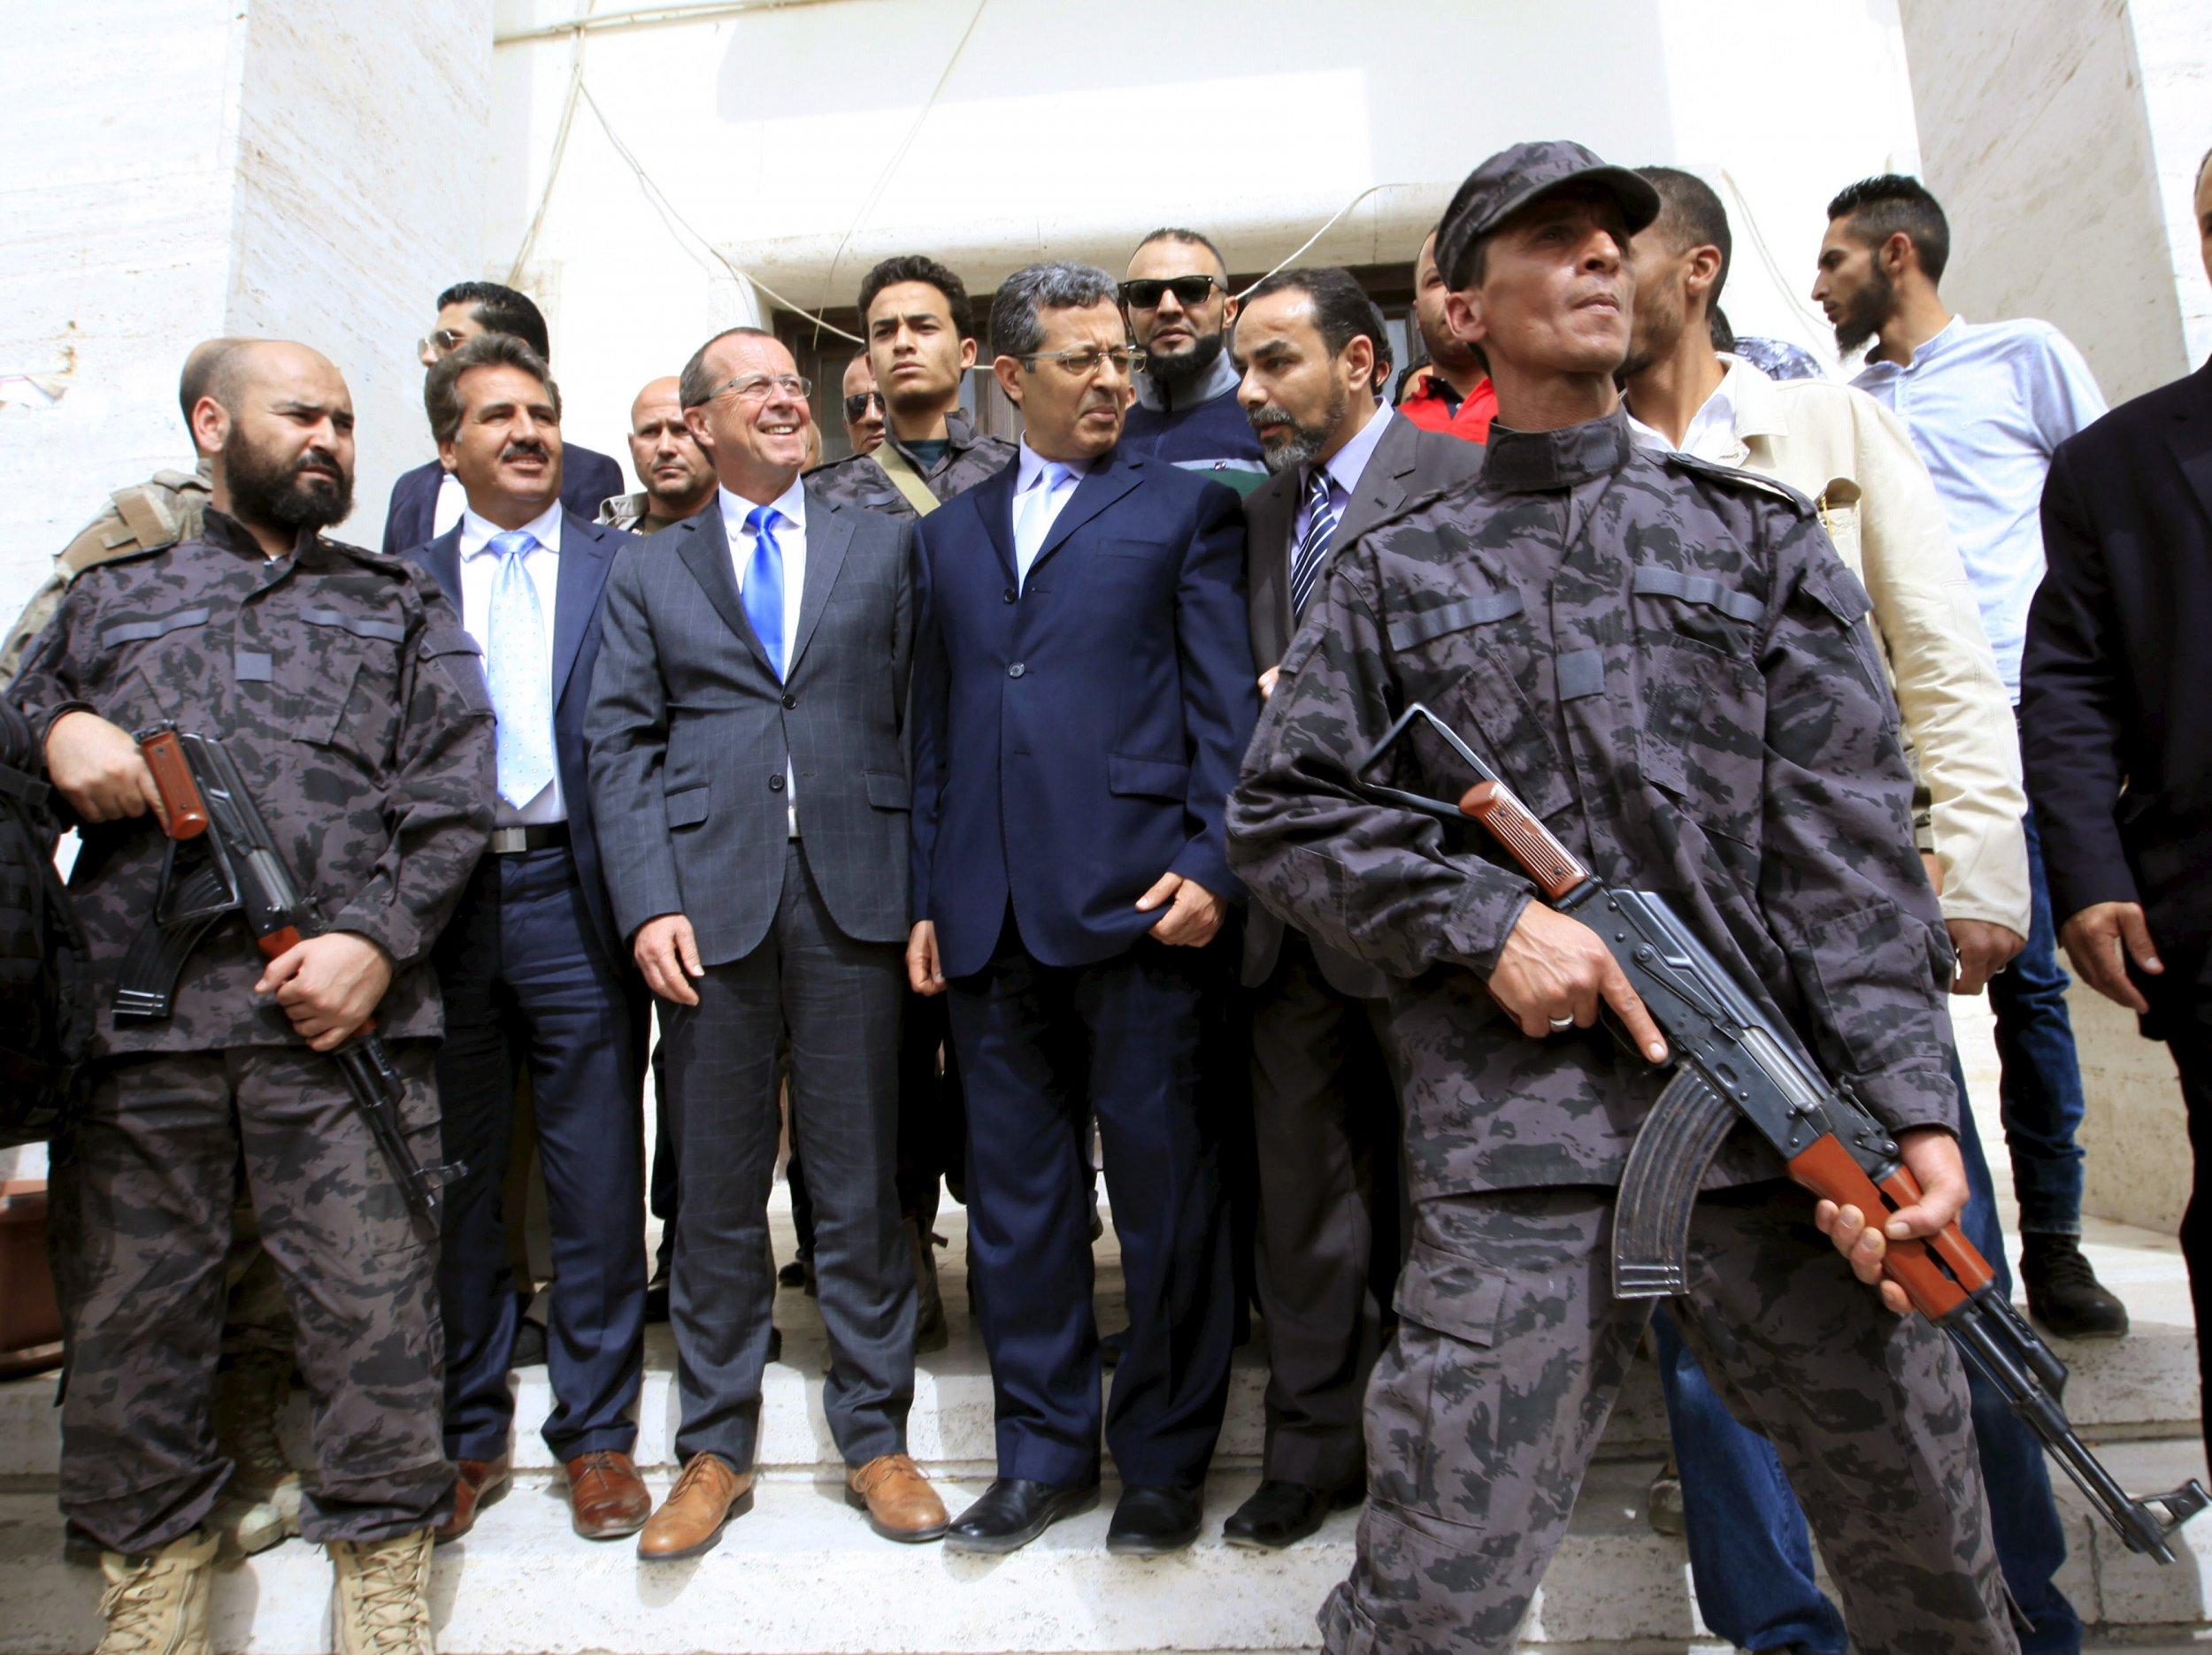 Libya's unity government